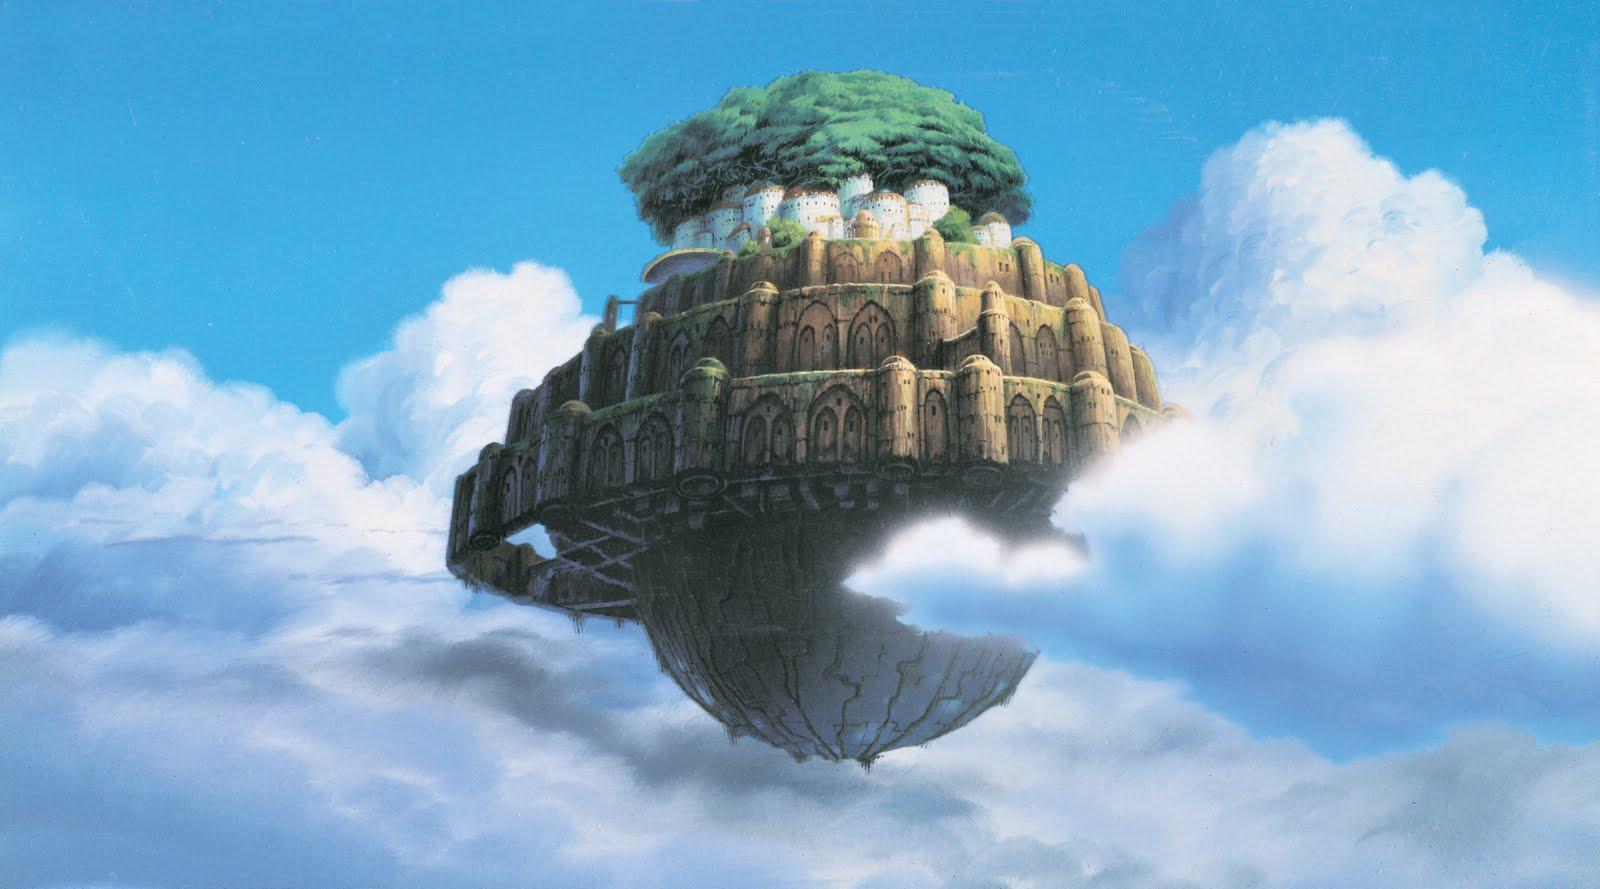 Japanese wallpapers Studio Ghibli related wallpapers 1600x889